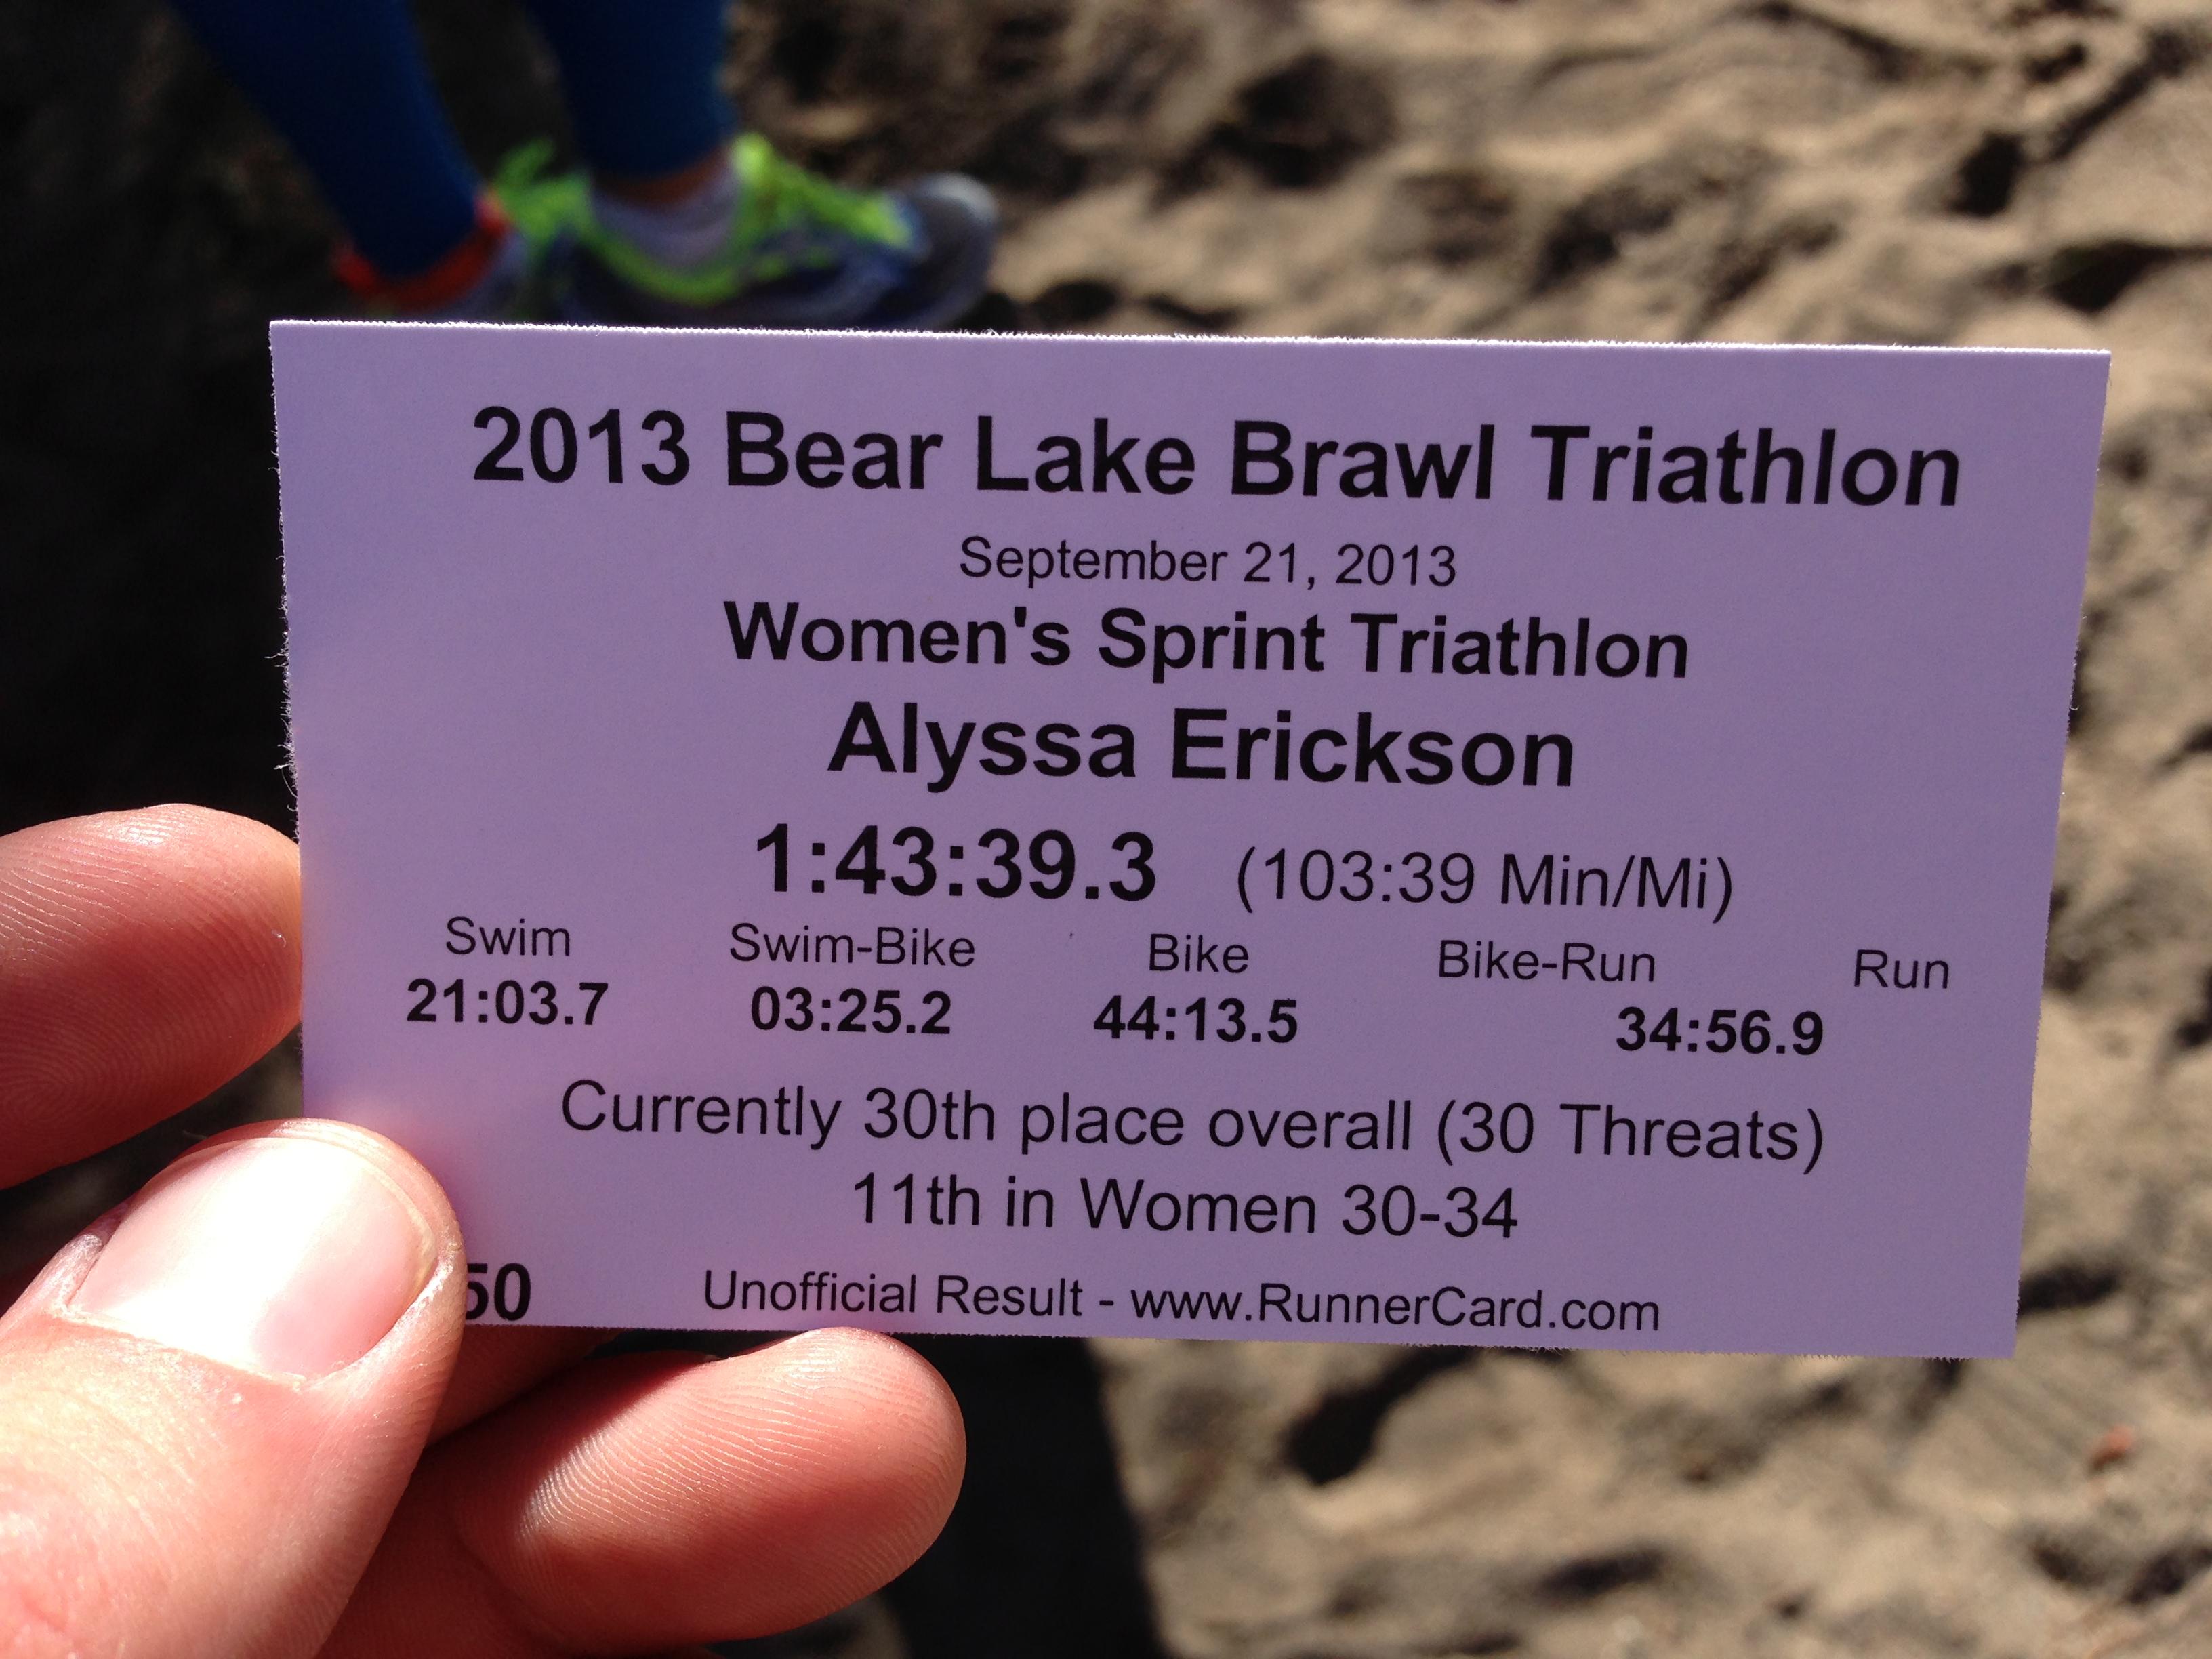 Bear Lake Brawl Results